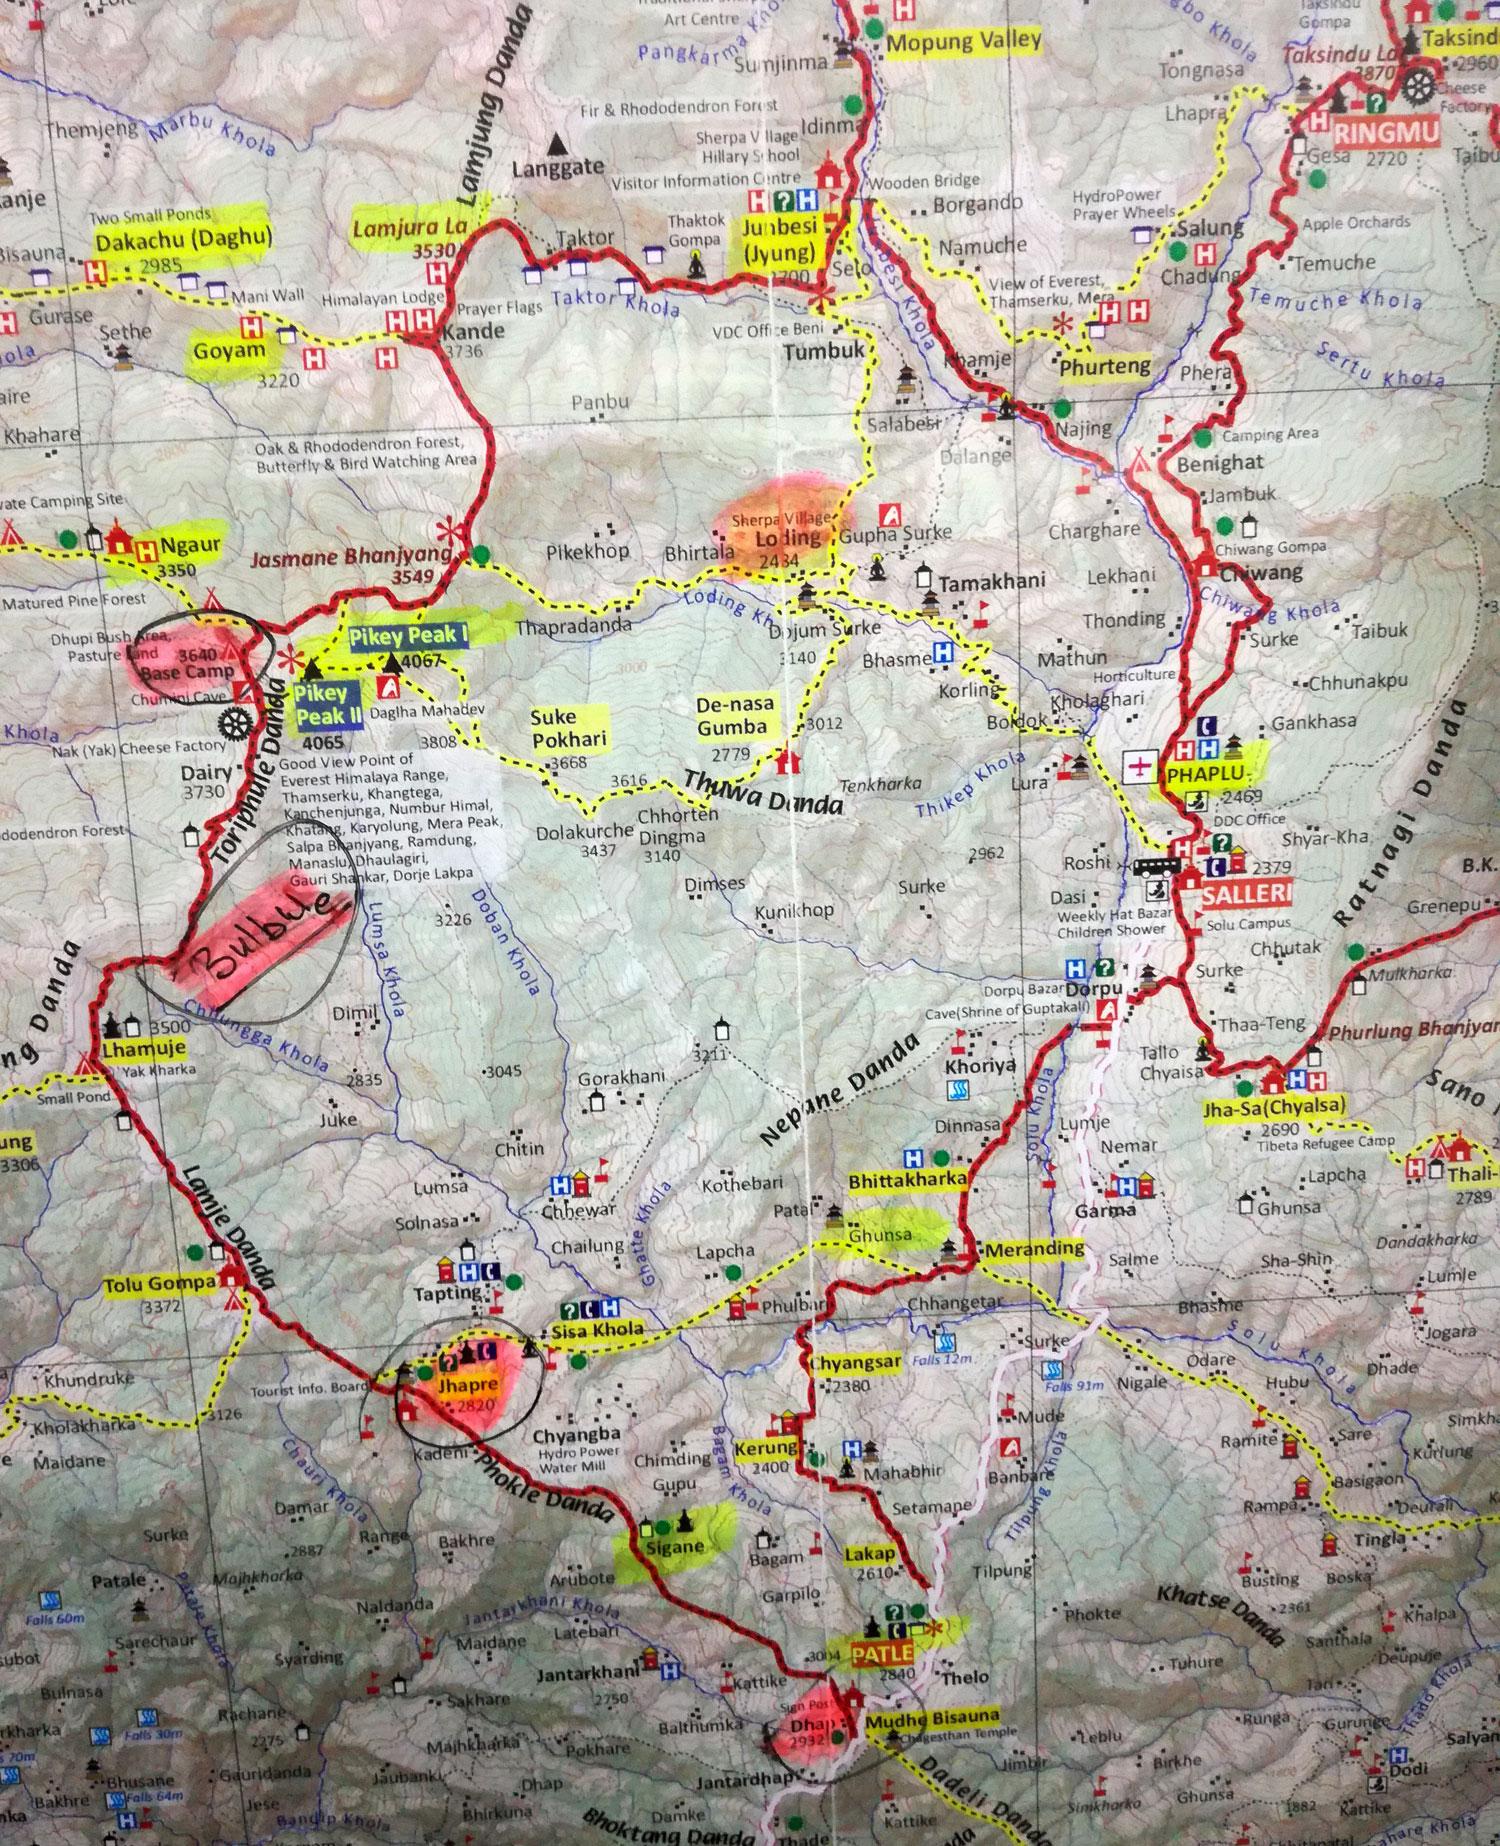 Pikey Peak Trek Map